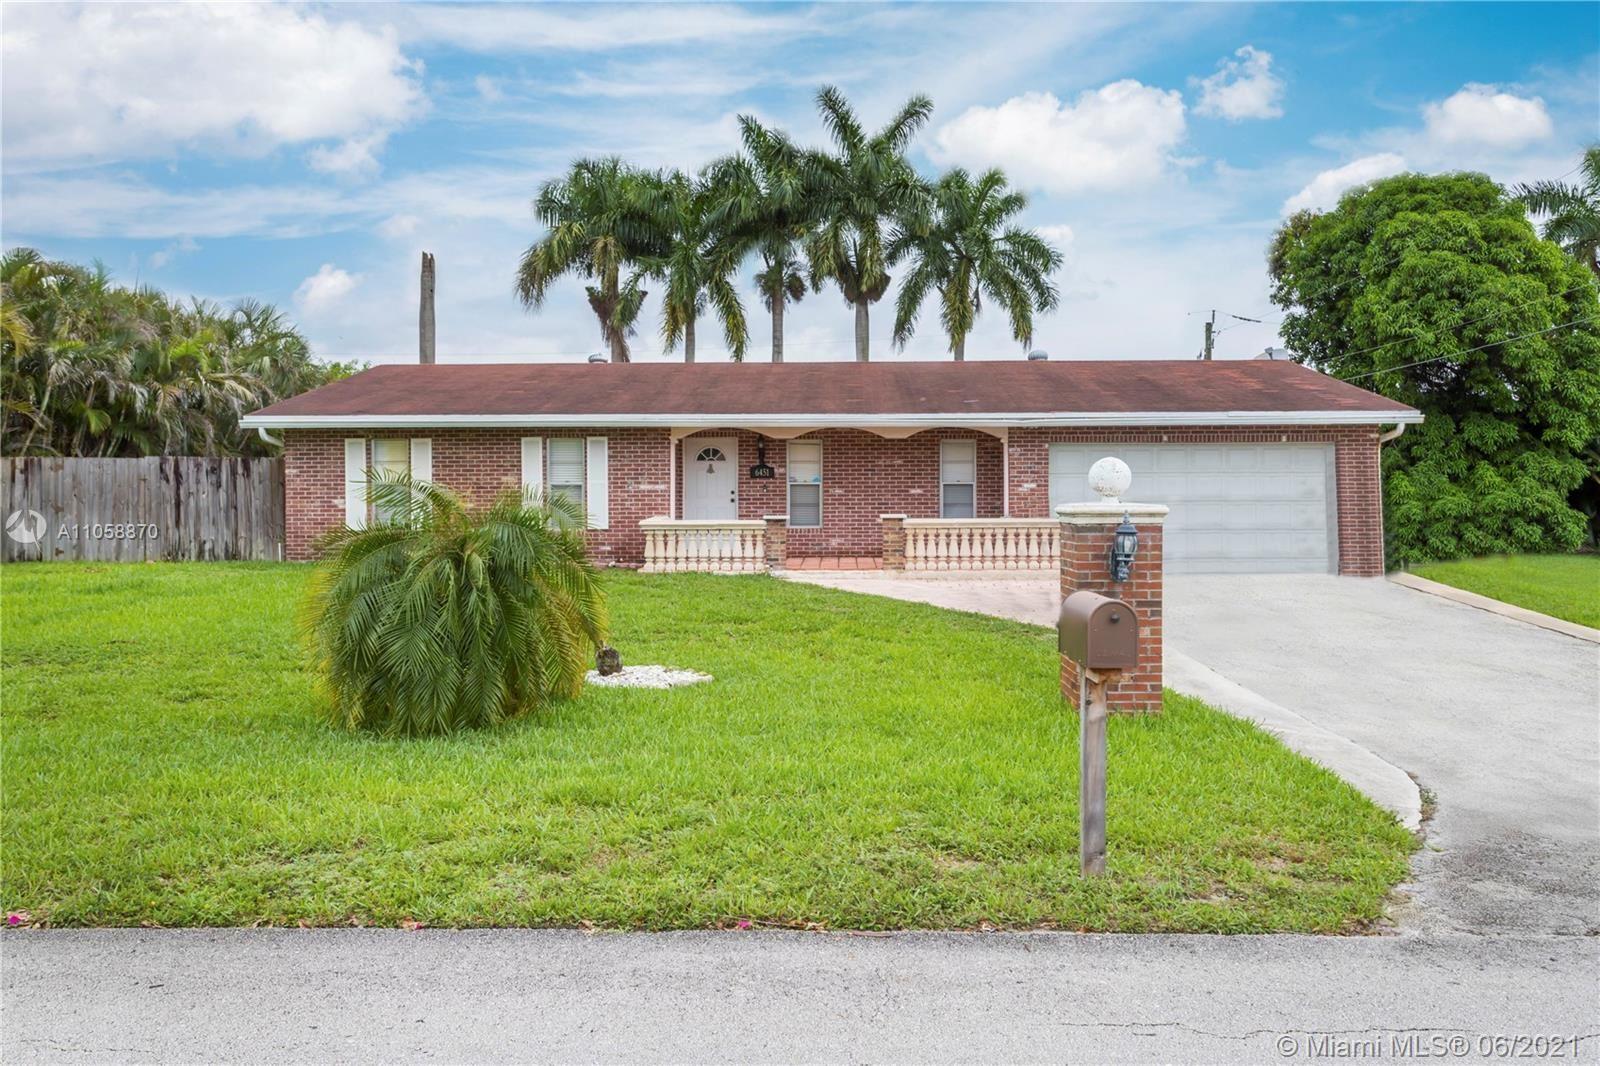 Photo of 6451 SW 56th St, Davie, FL 33314 (MLS # A11058870)